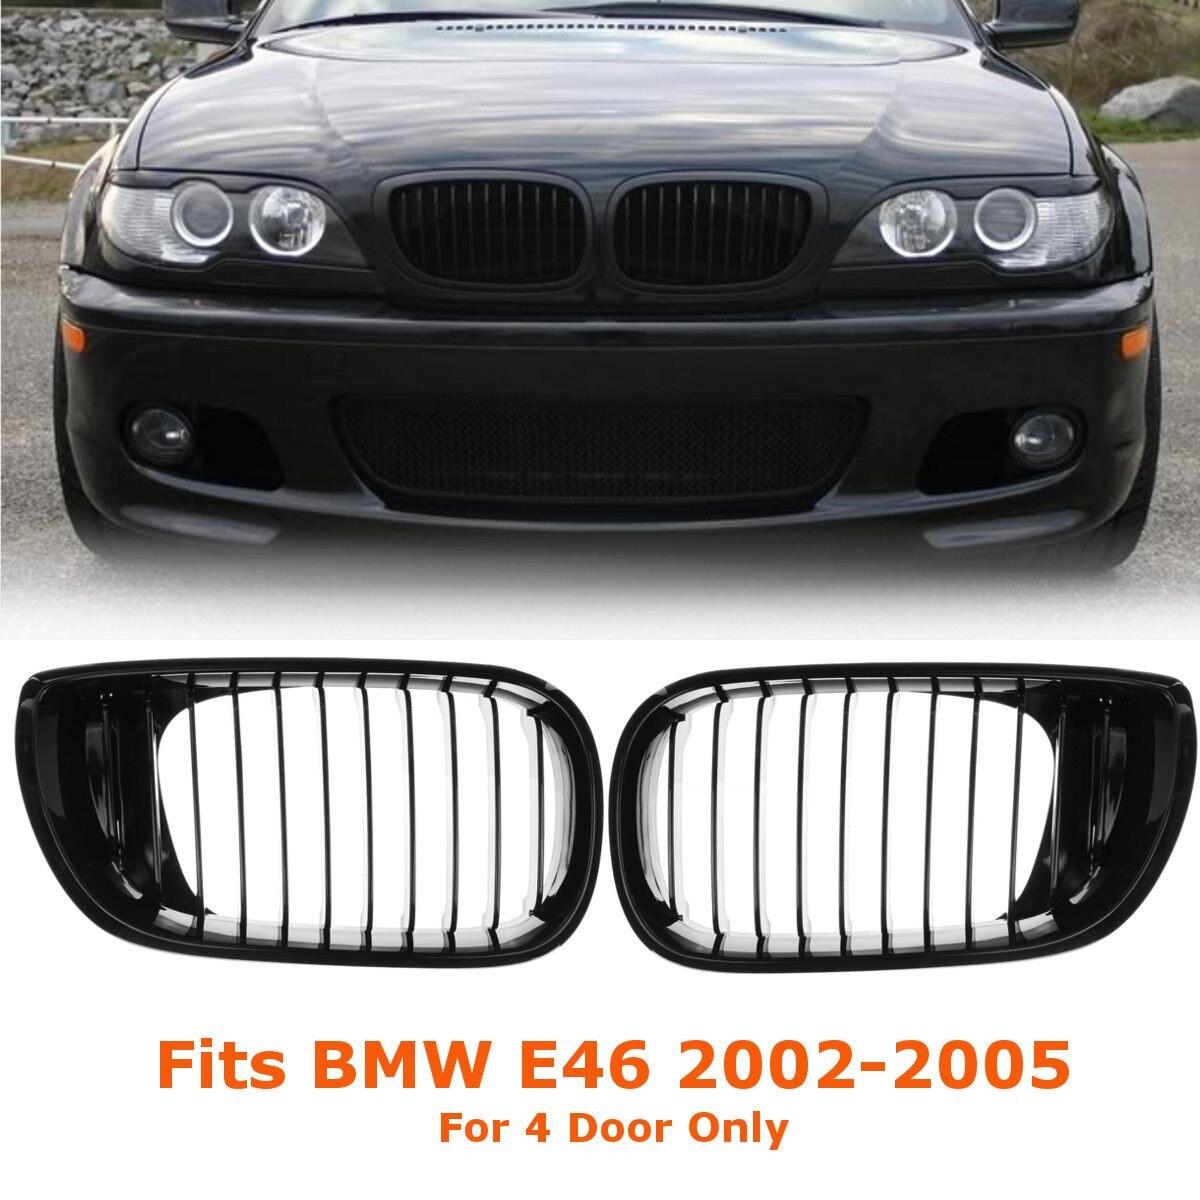 2 Pcs Carro Gloss Black Carro Frente Rim Corrida Grille Grill Para BMW E46 LCI Facelift 4D 325i 2002 2003 2004 2005